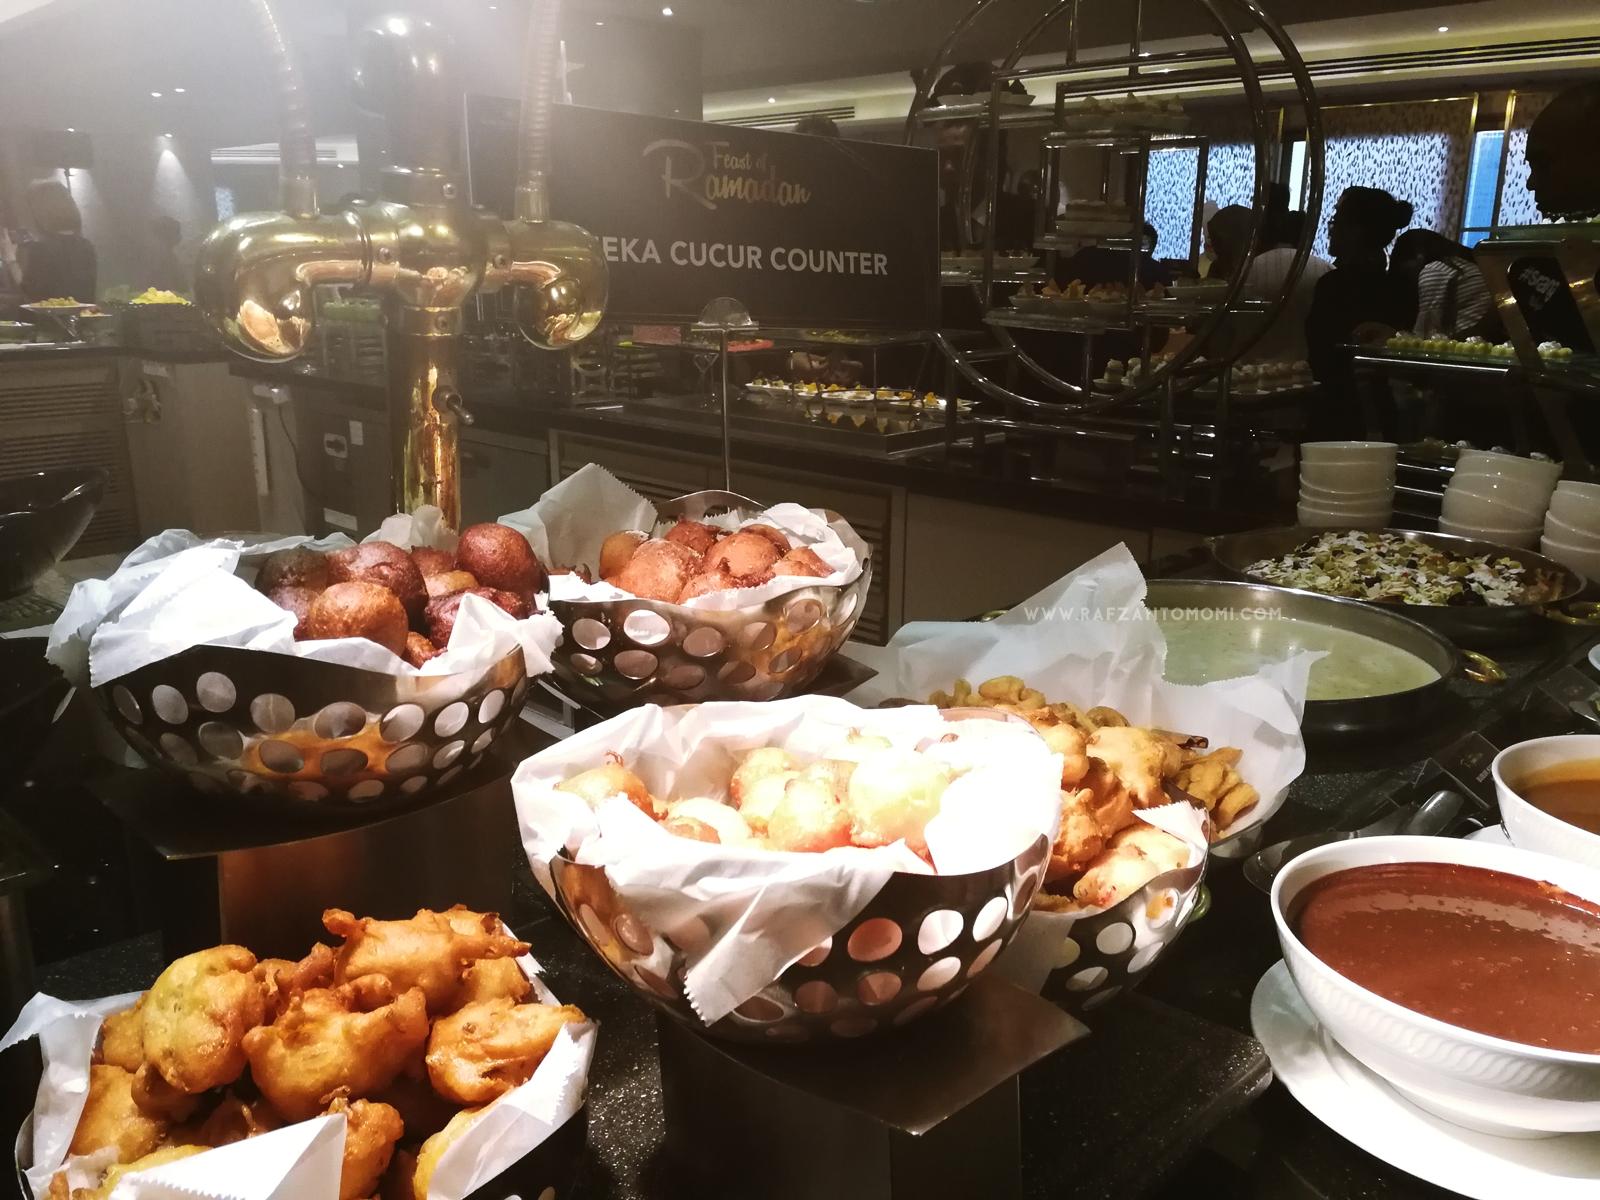 Buffet Ramadhan 2018 - Buka Puasa Di Coffee House, Sunway Putra Hotel Kuala Lumpur